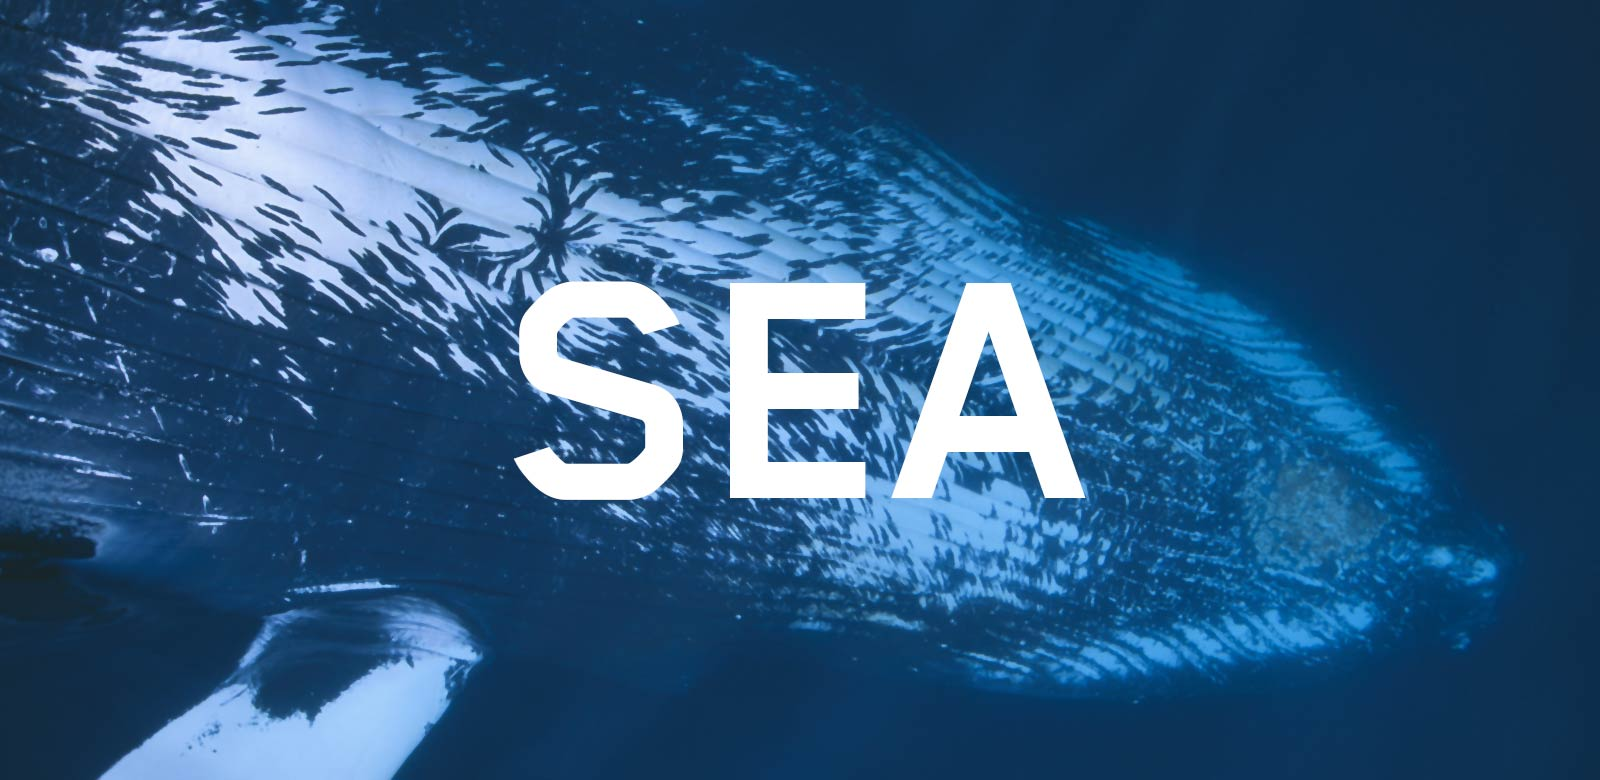 Under Pressure - Sea